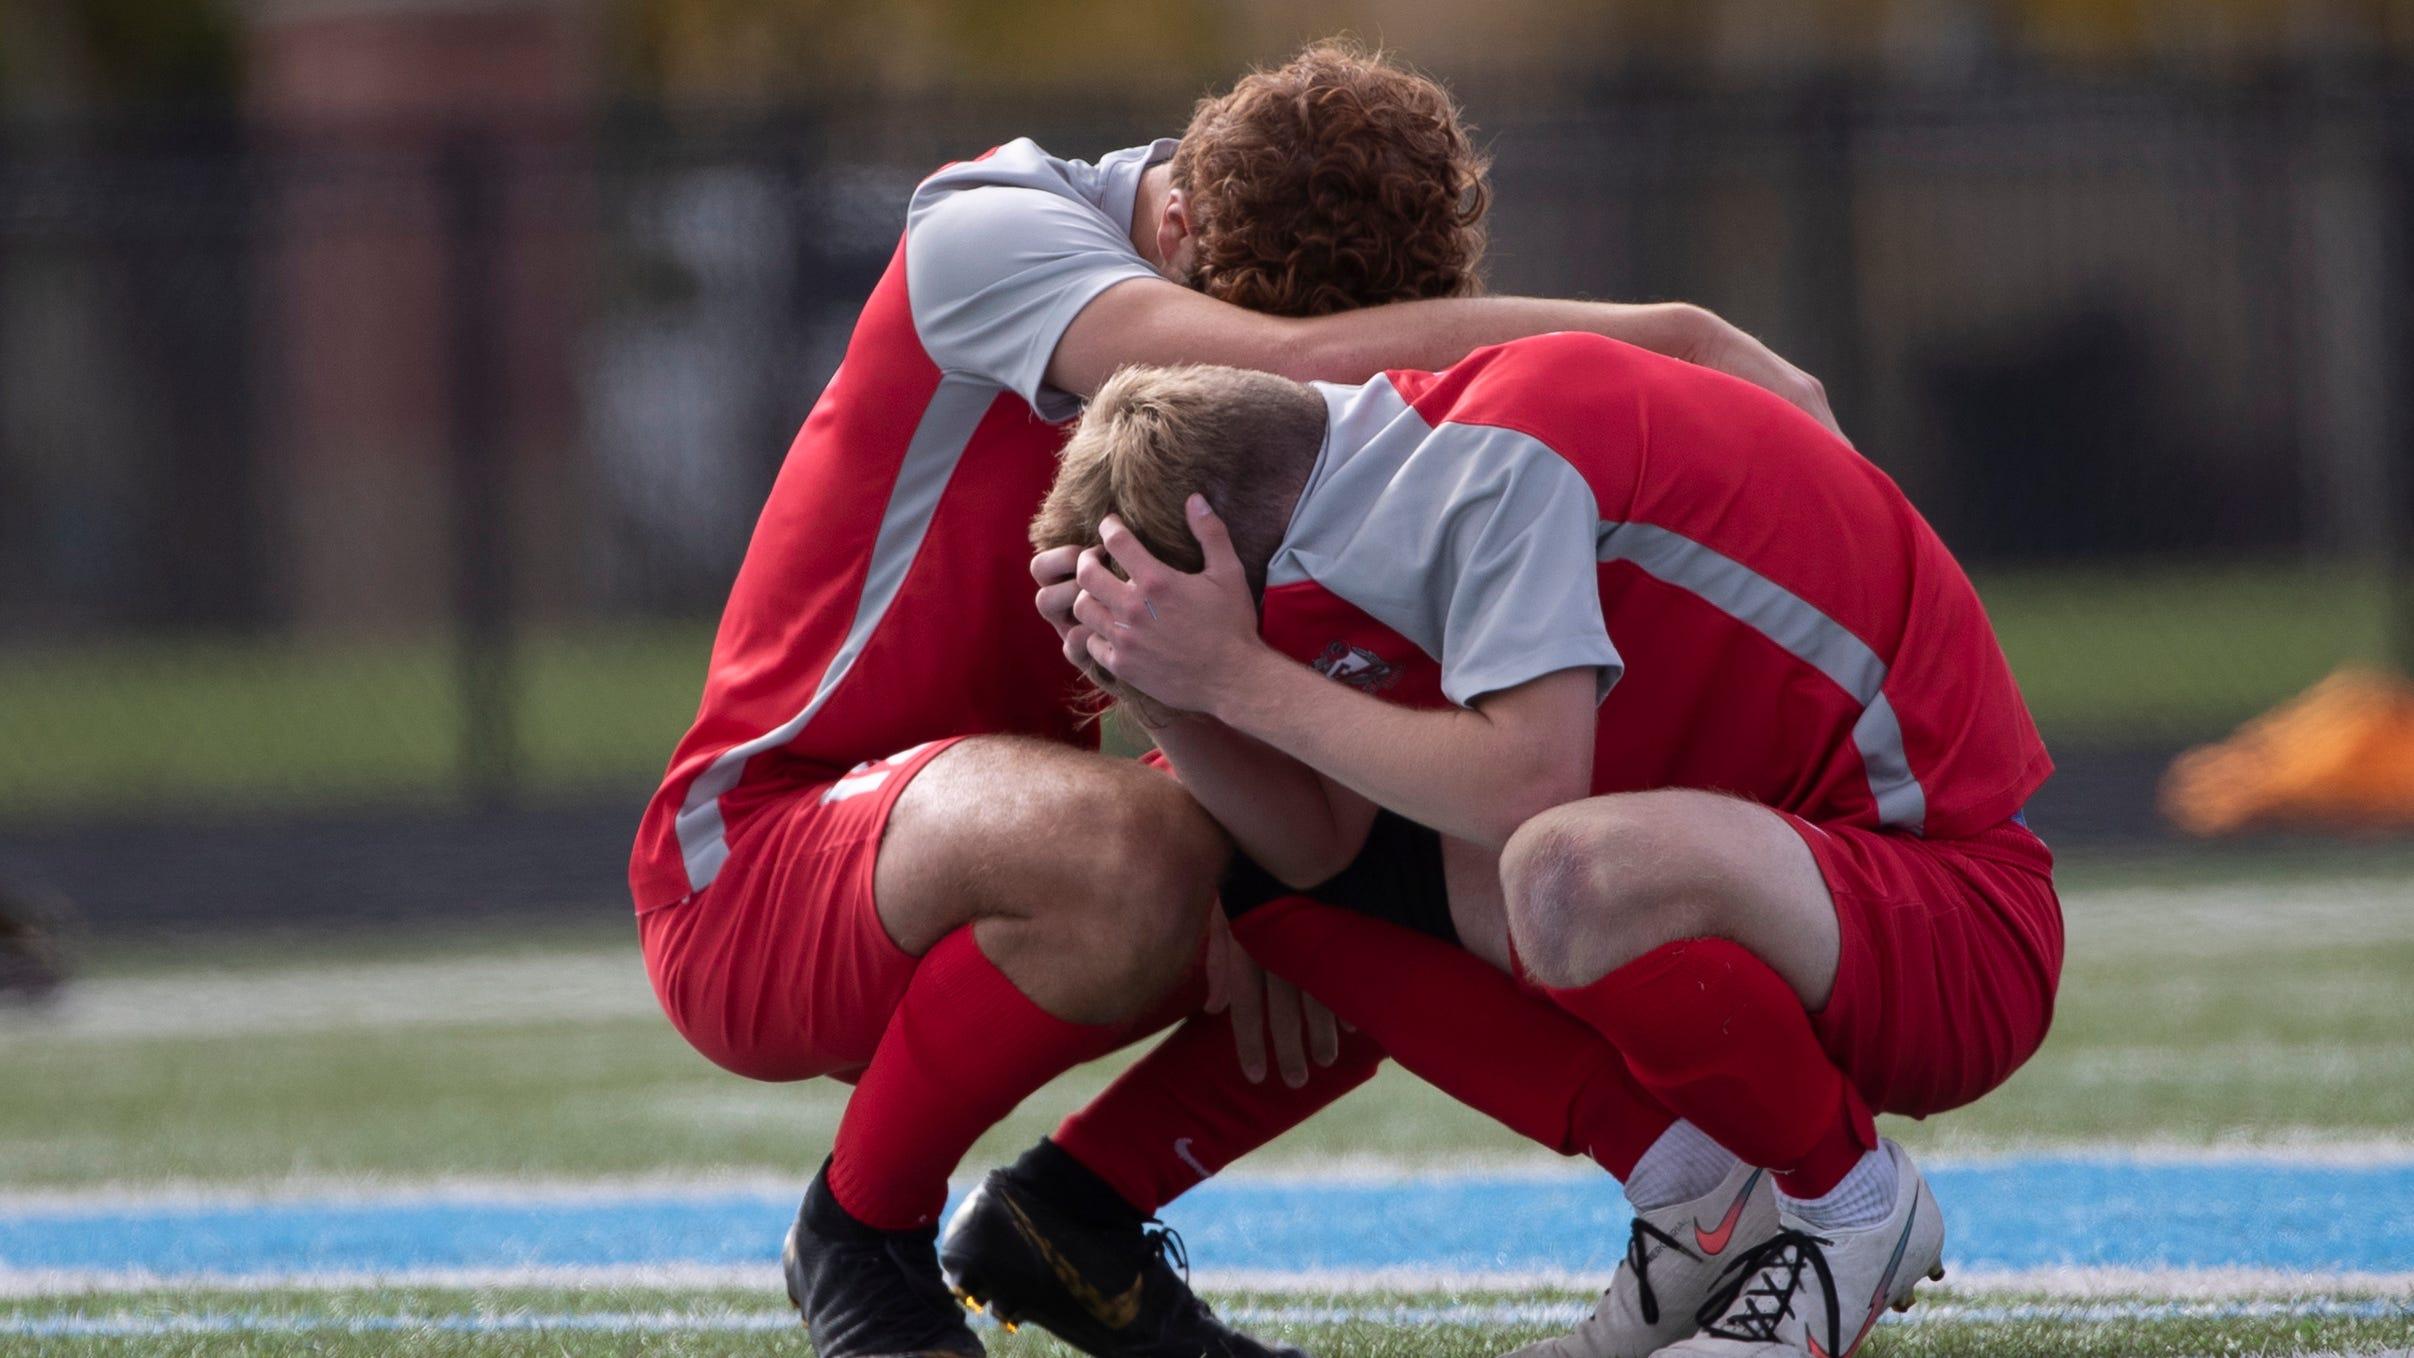 IHSAA playoffs: Fishers boys soccer season ends in penalty-kick loss in semistate